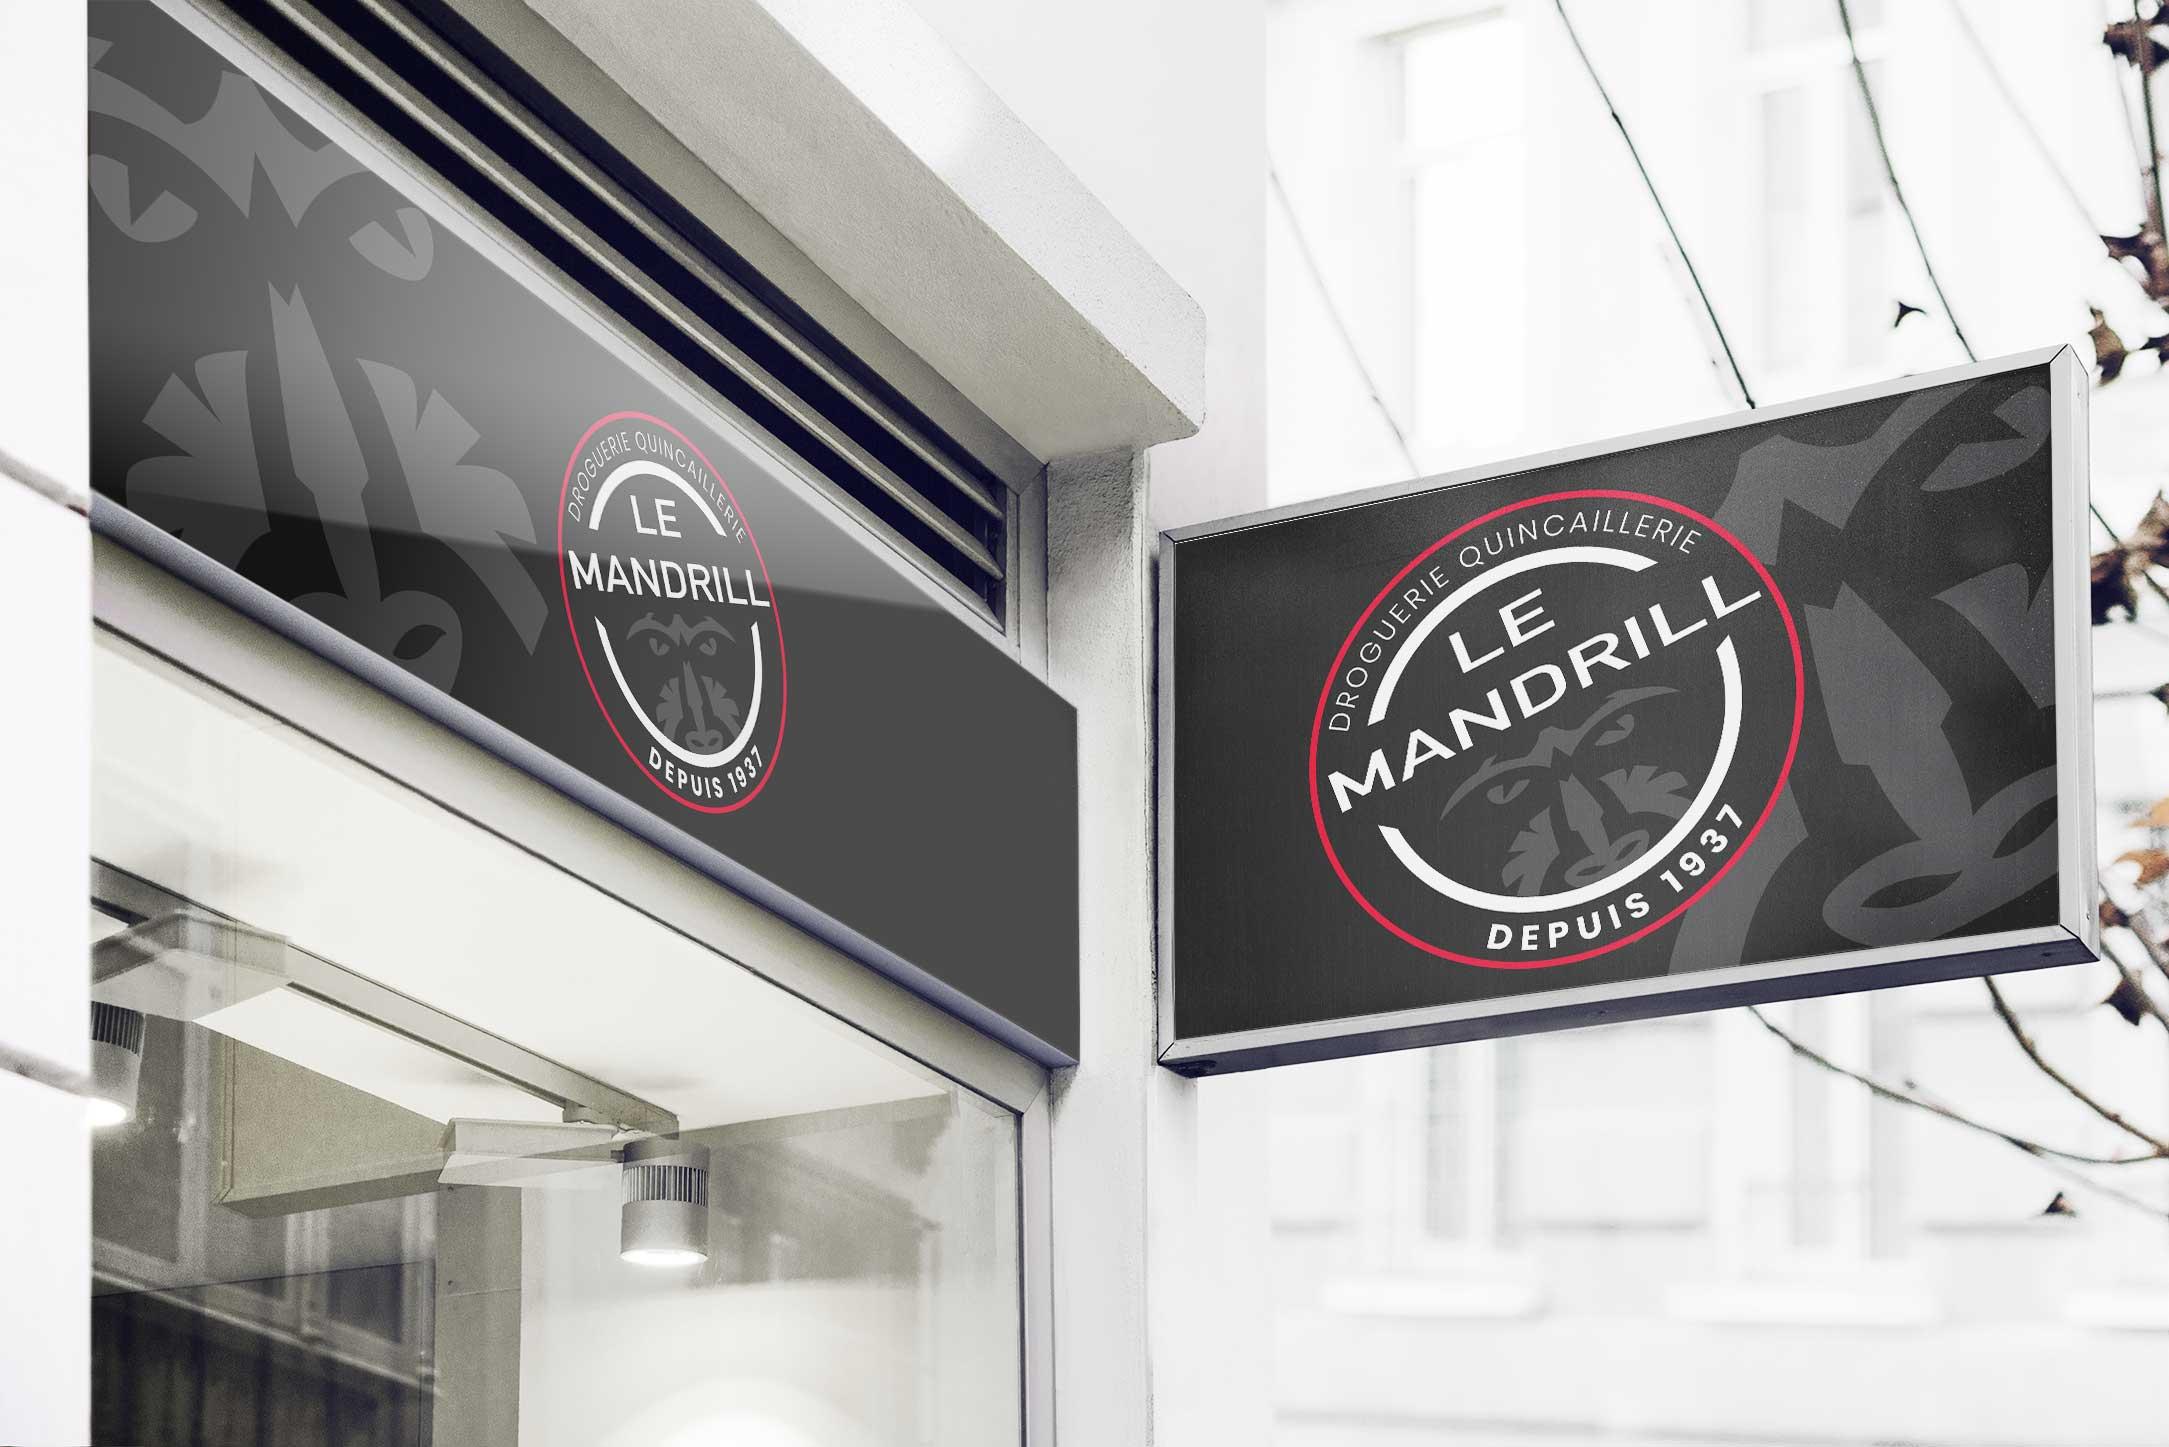 logo-enseigne-SocieteLeMandrill-lemandrill-70- boulevardAlsaceLorraine-bayonne-commercedeproximite-drogueries-quincaillerie